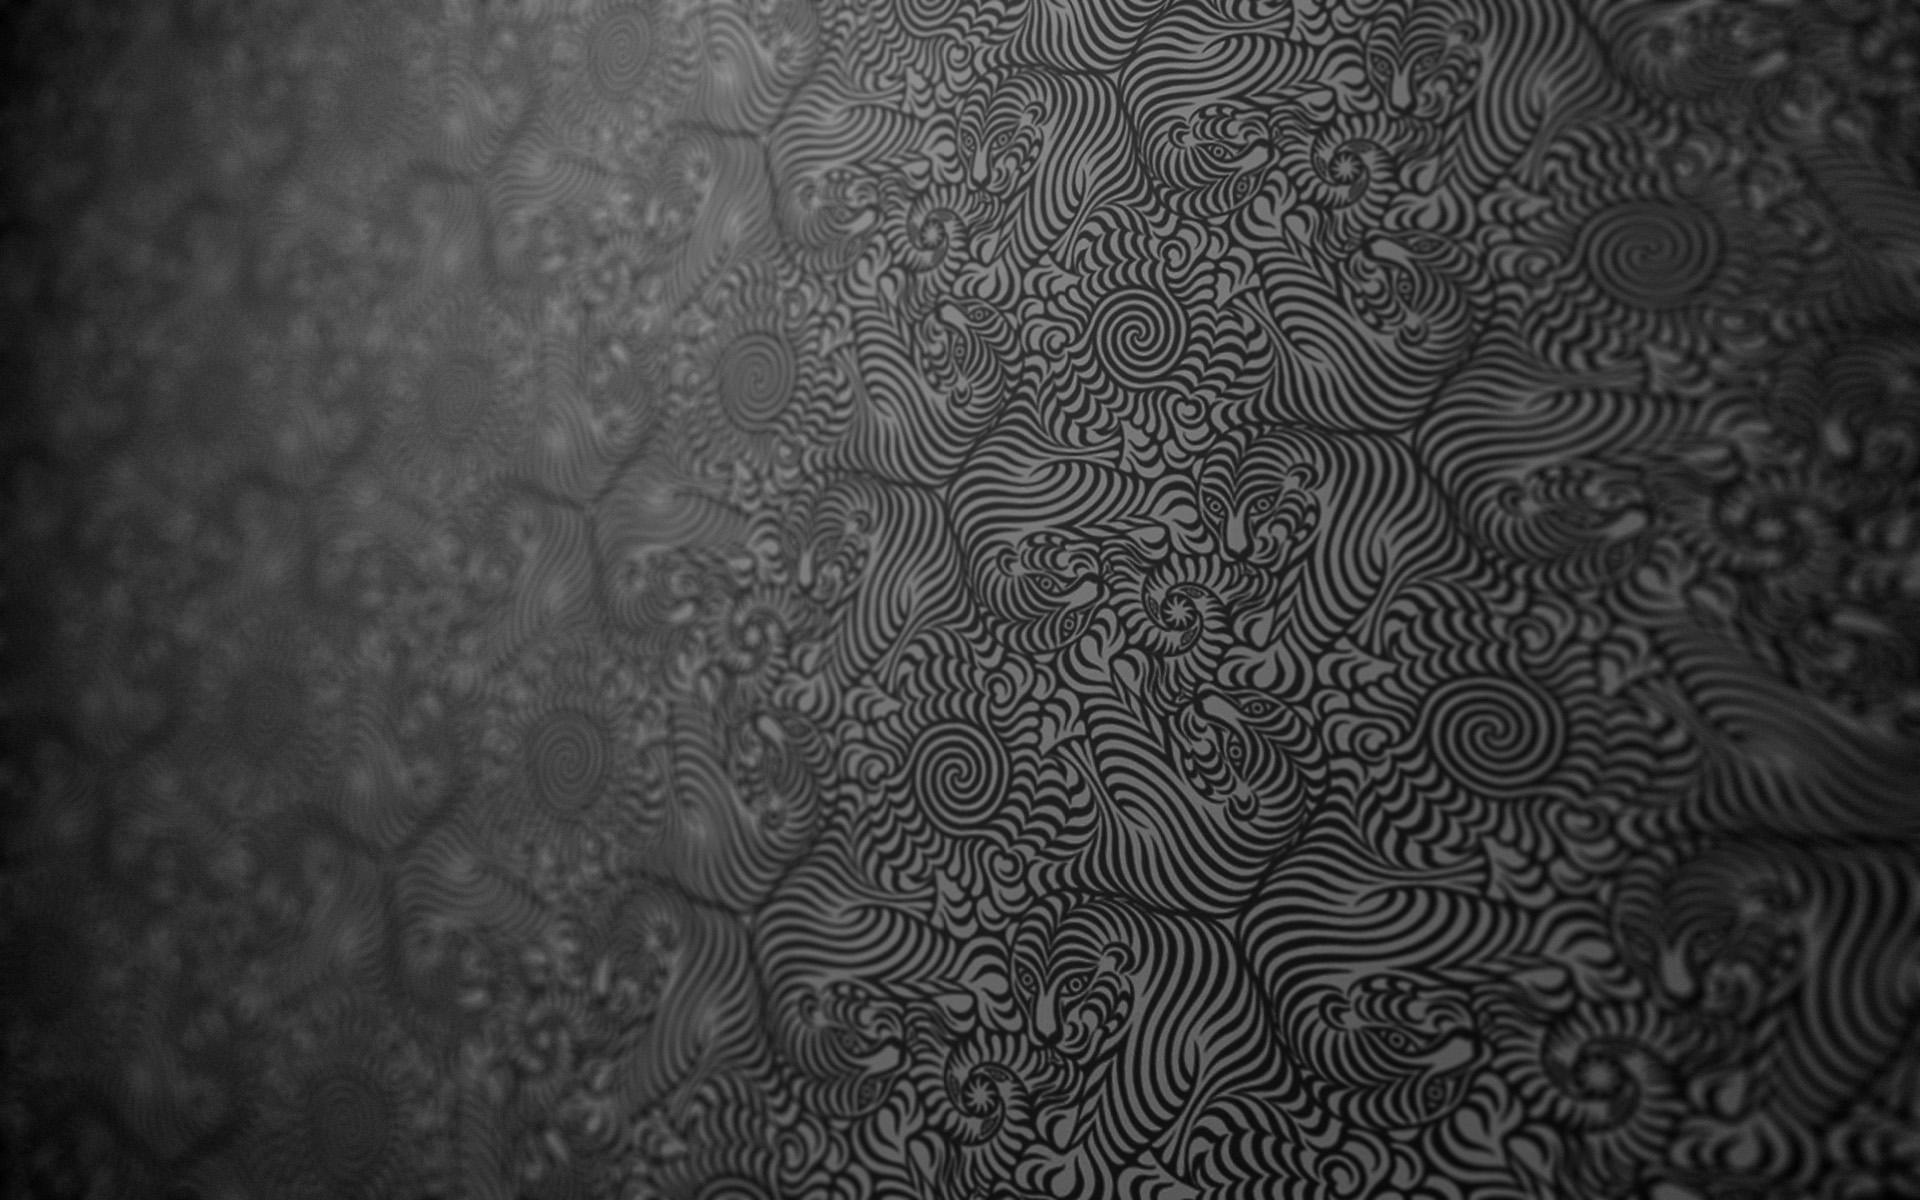 pattern abstract fractal artwork digital art texture textured tiger monochrome tassellation